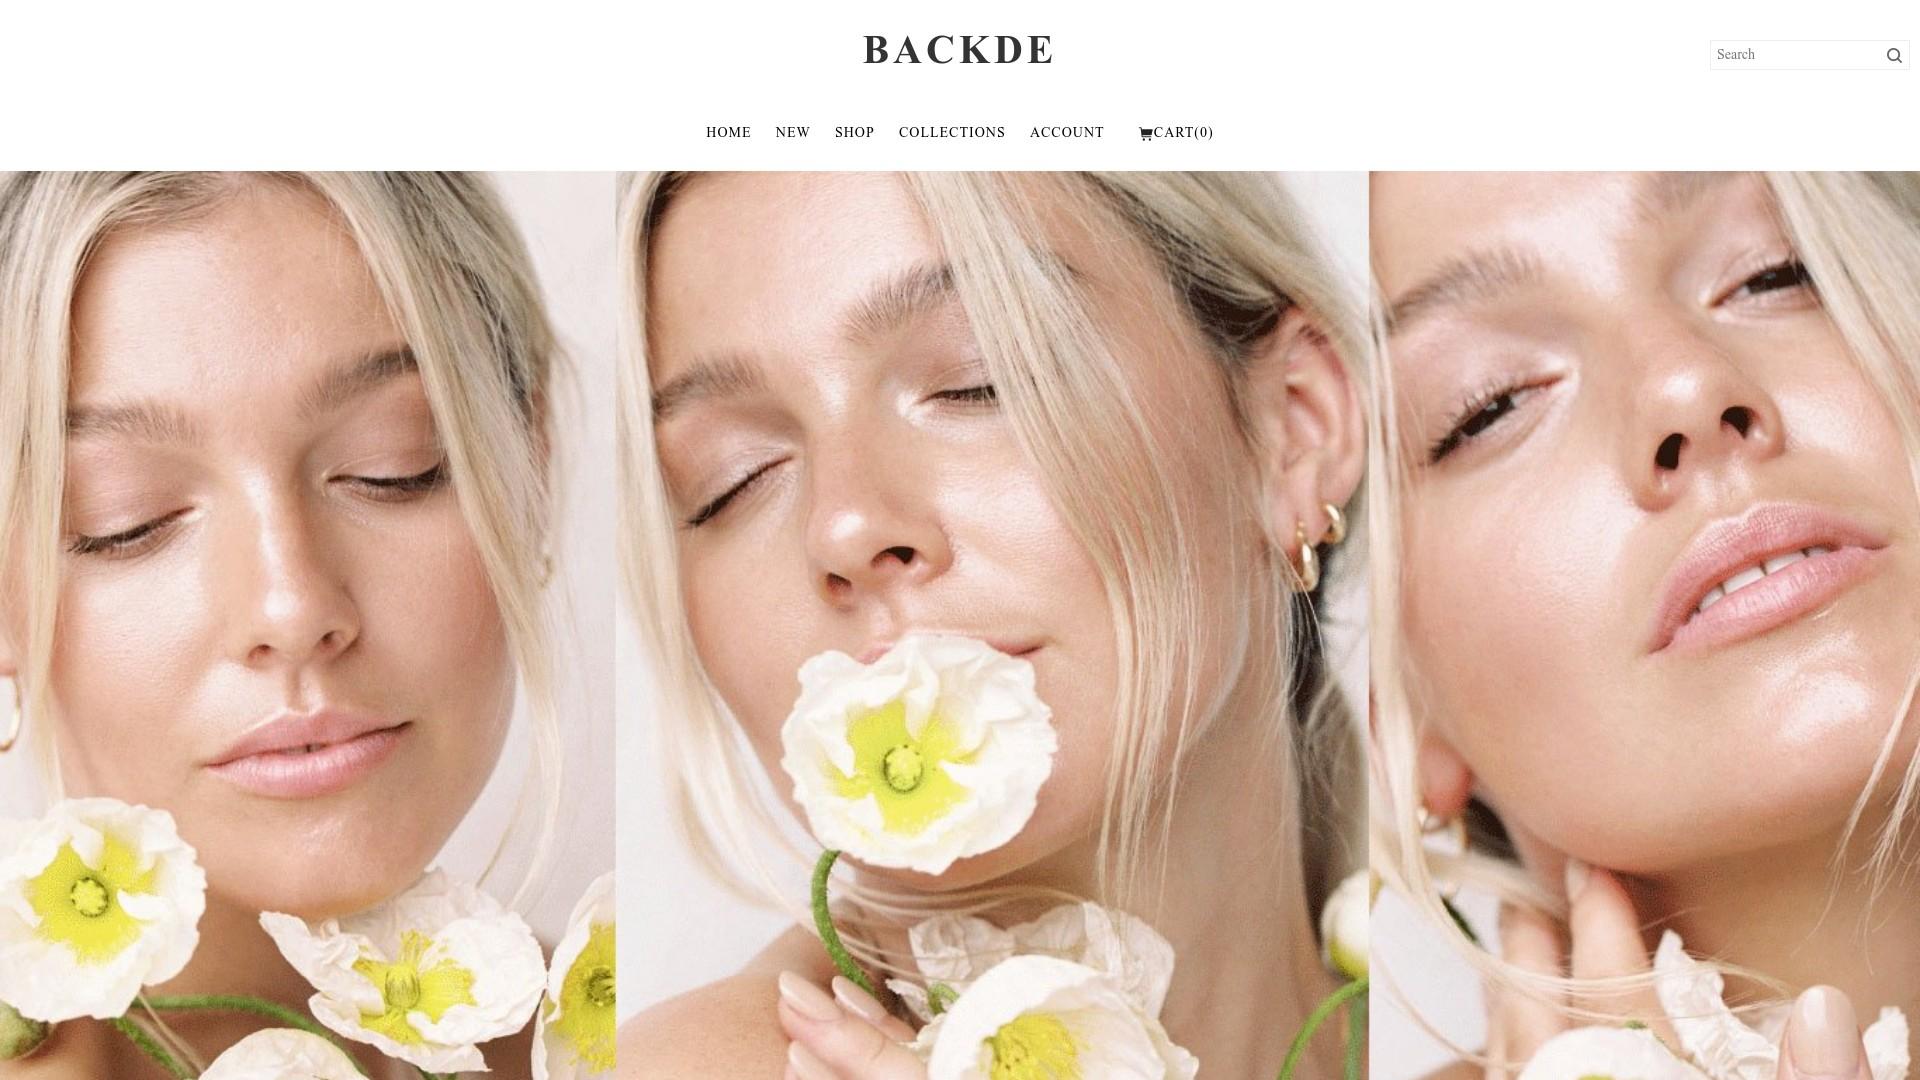 Backde Com Reviews  is the Online Store a Scam?